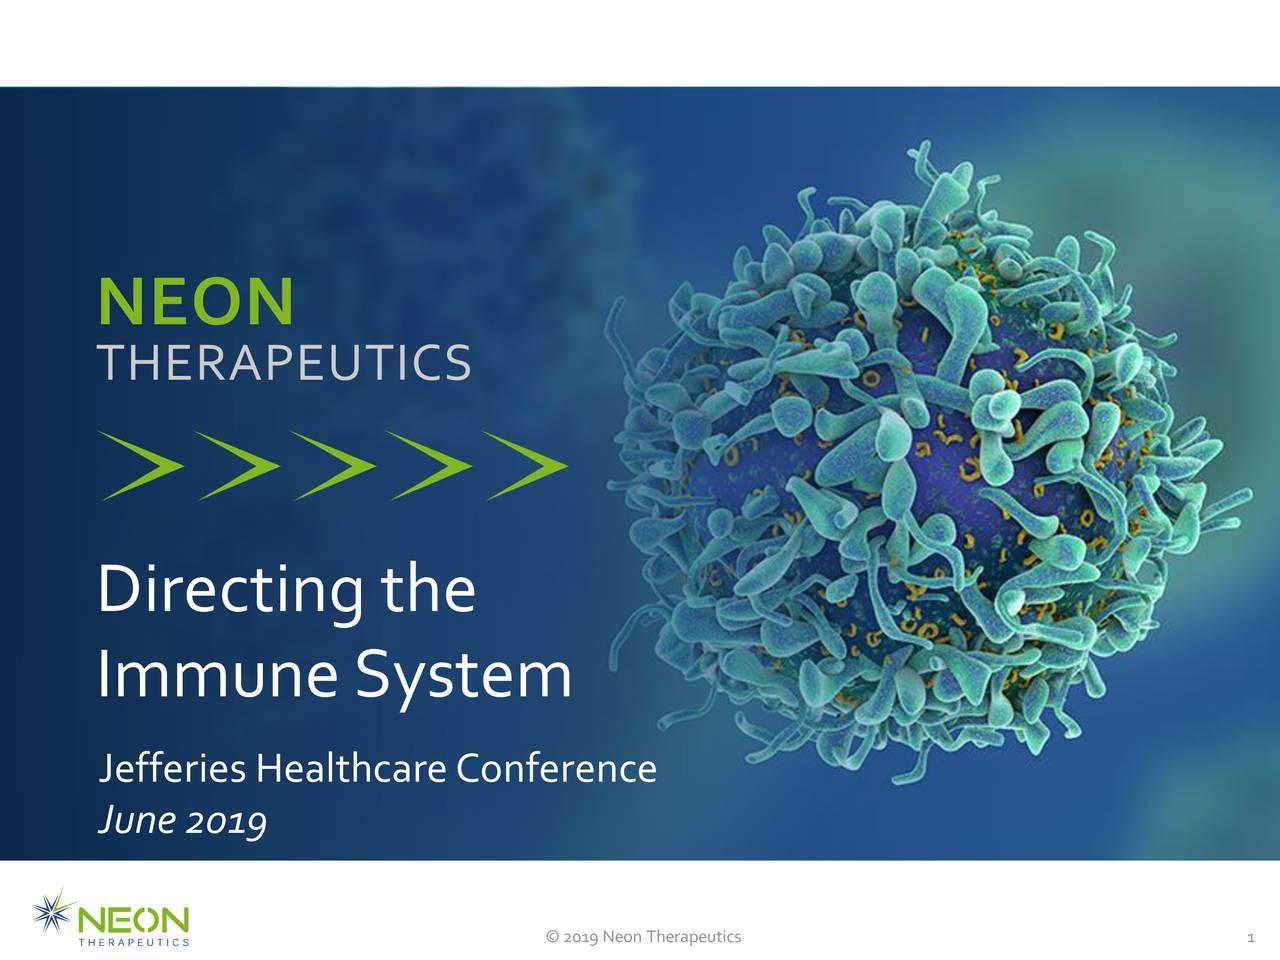 THERAPEUTICS Directing the ImmuneSystem JefferiesHealthcareConference June2019